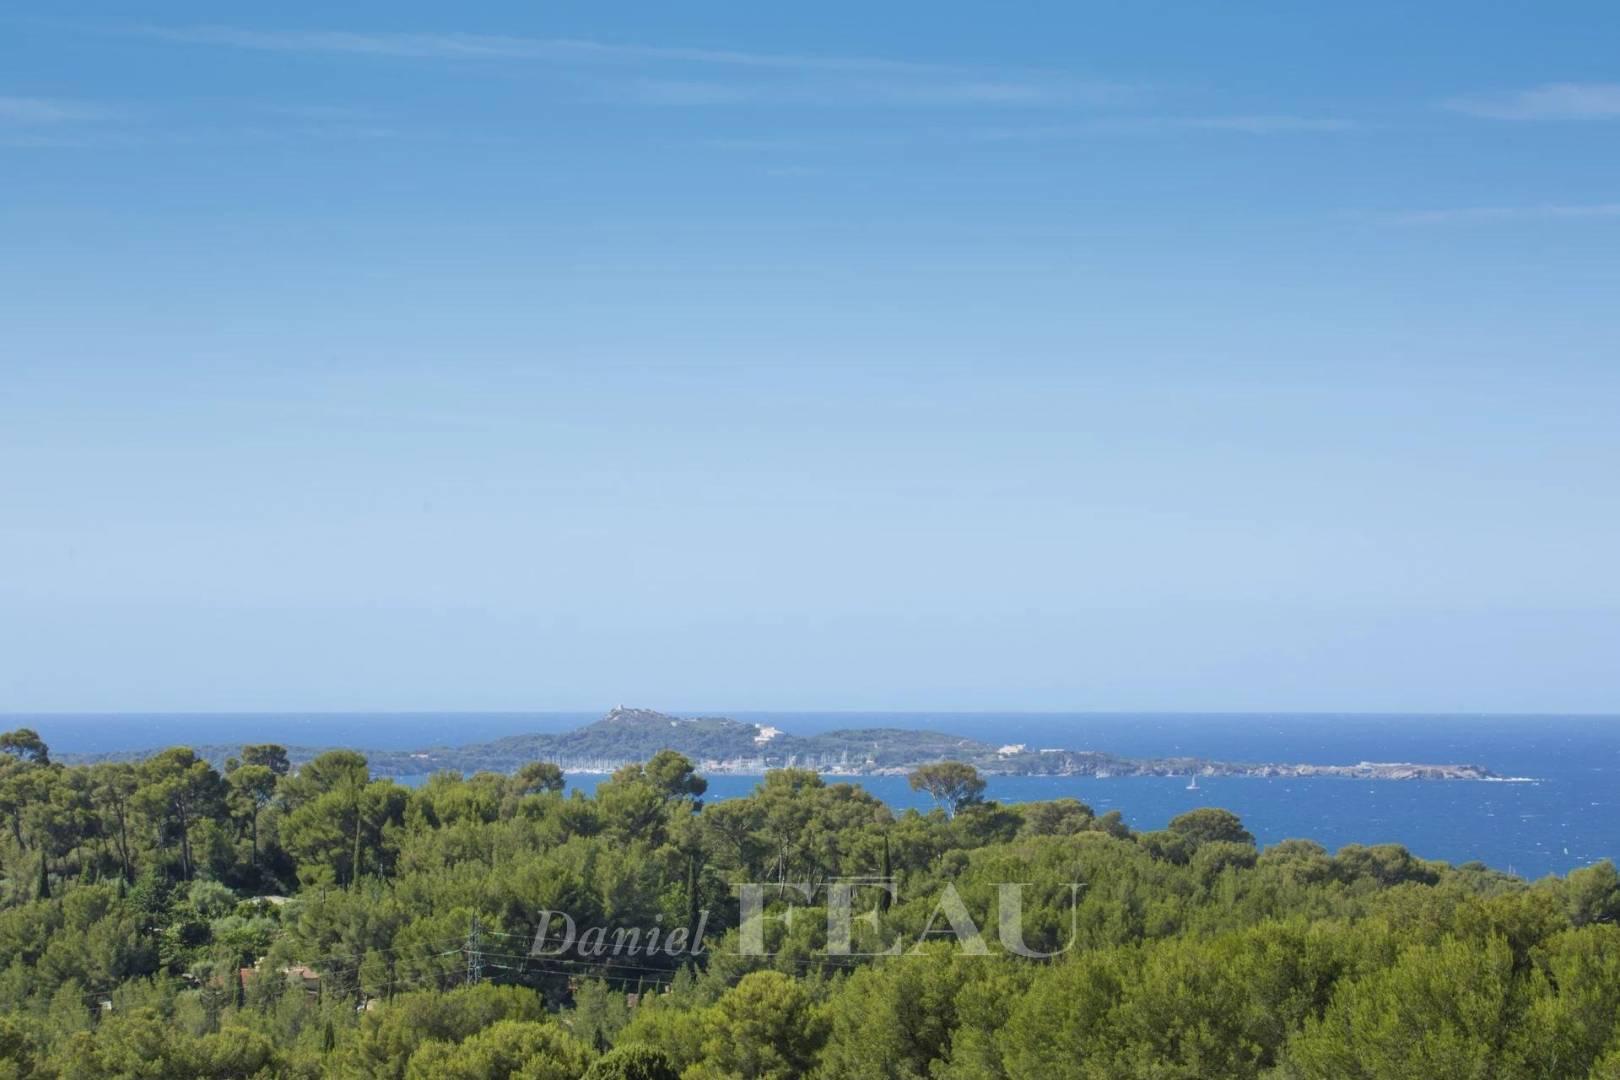 1 19 Sanary-sur-Mer